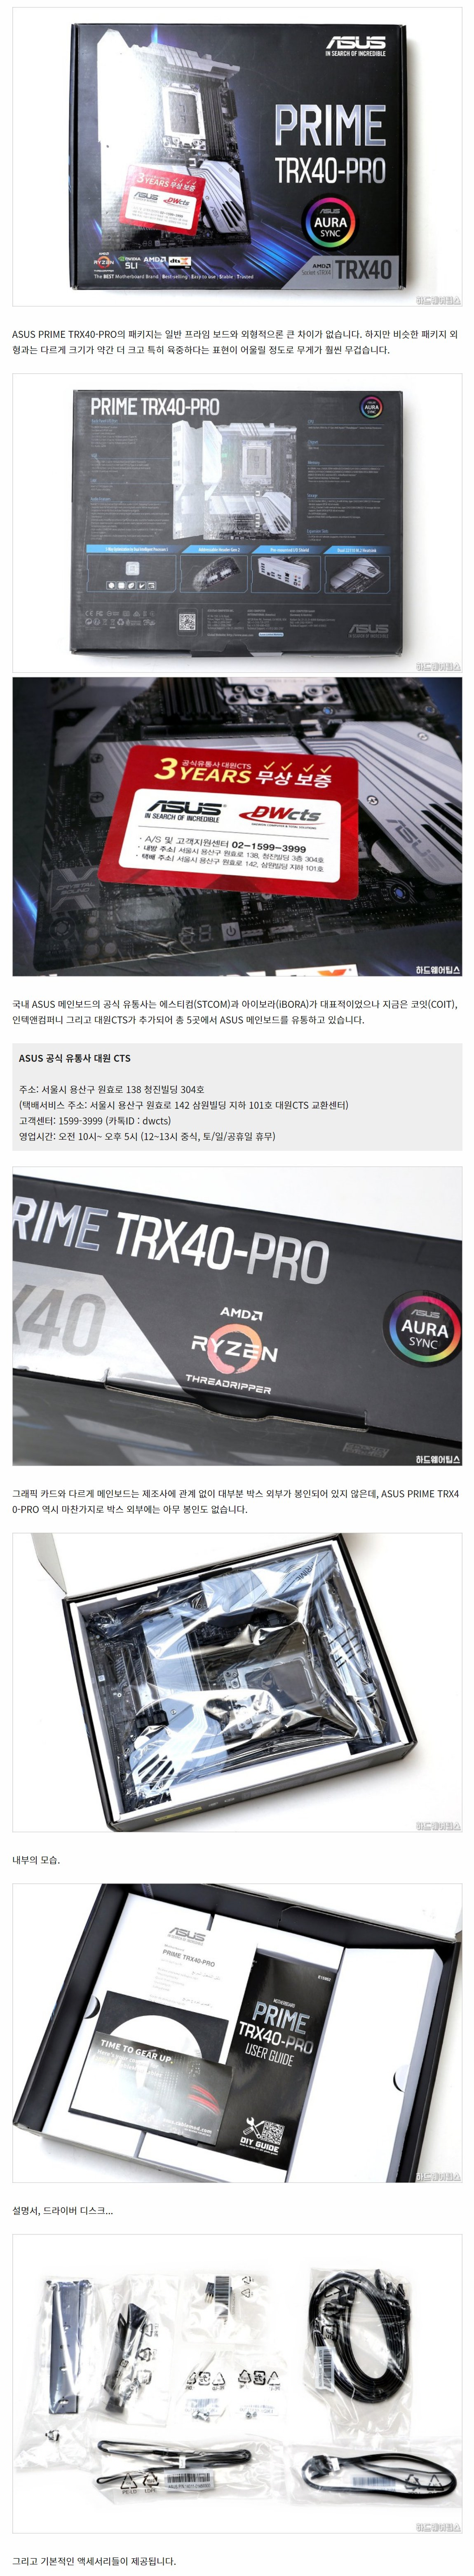 2_ASUS_PRIME_TRX40-PRO.jpg